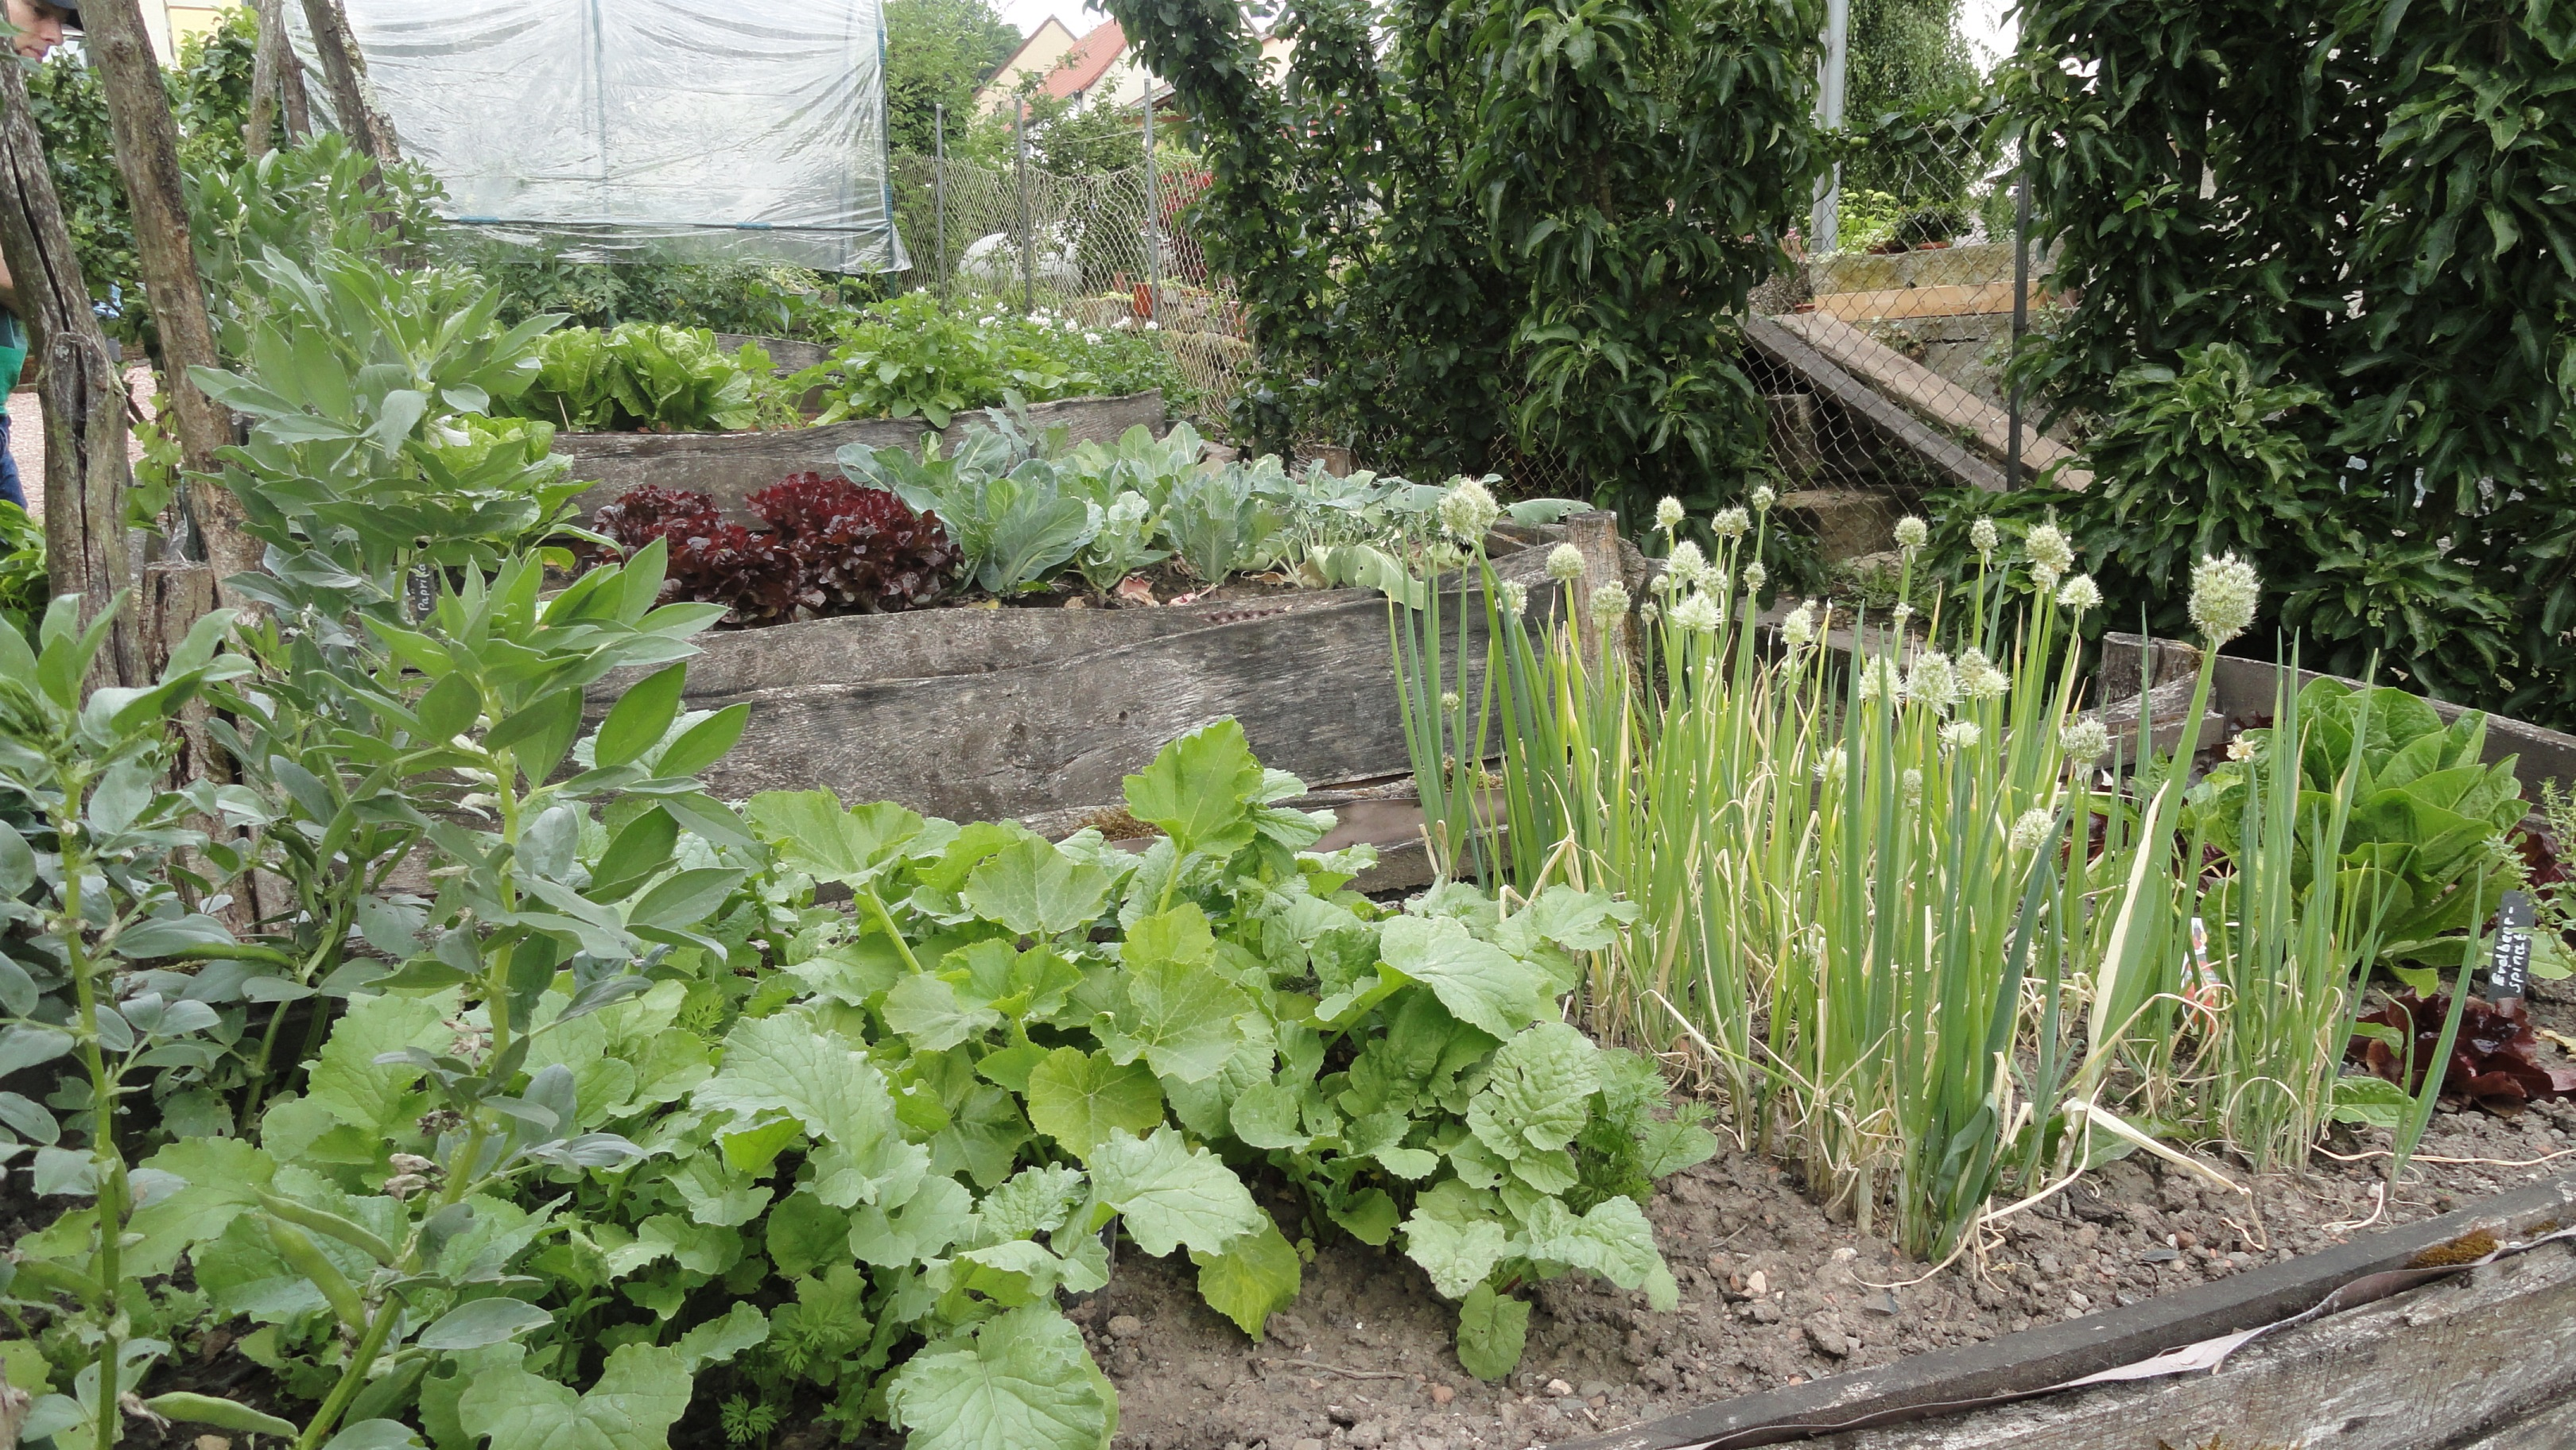 Gemüsebeet biblischer Garten Niederkirchen © Cora Berger